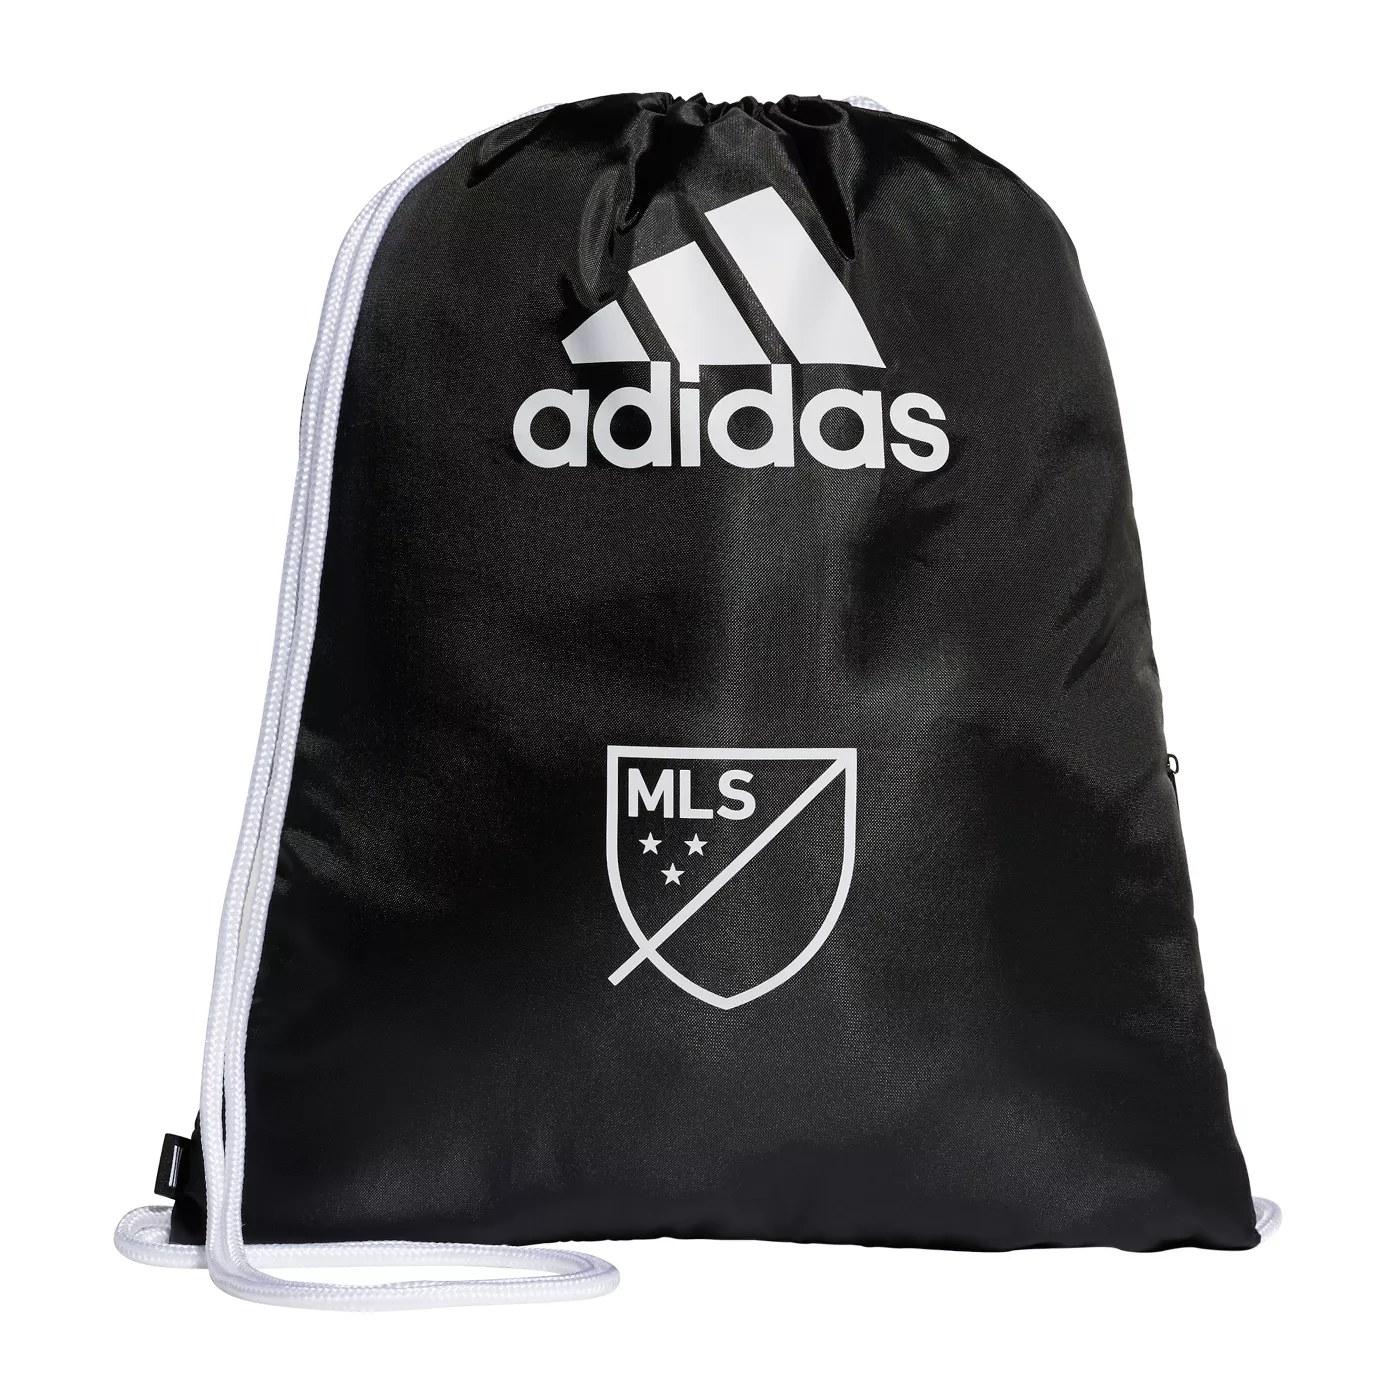 The MLS Adidas bag